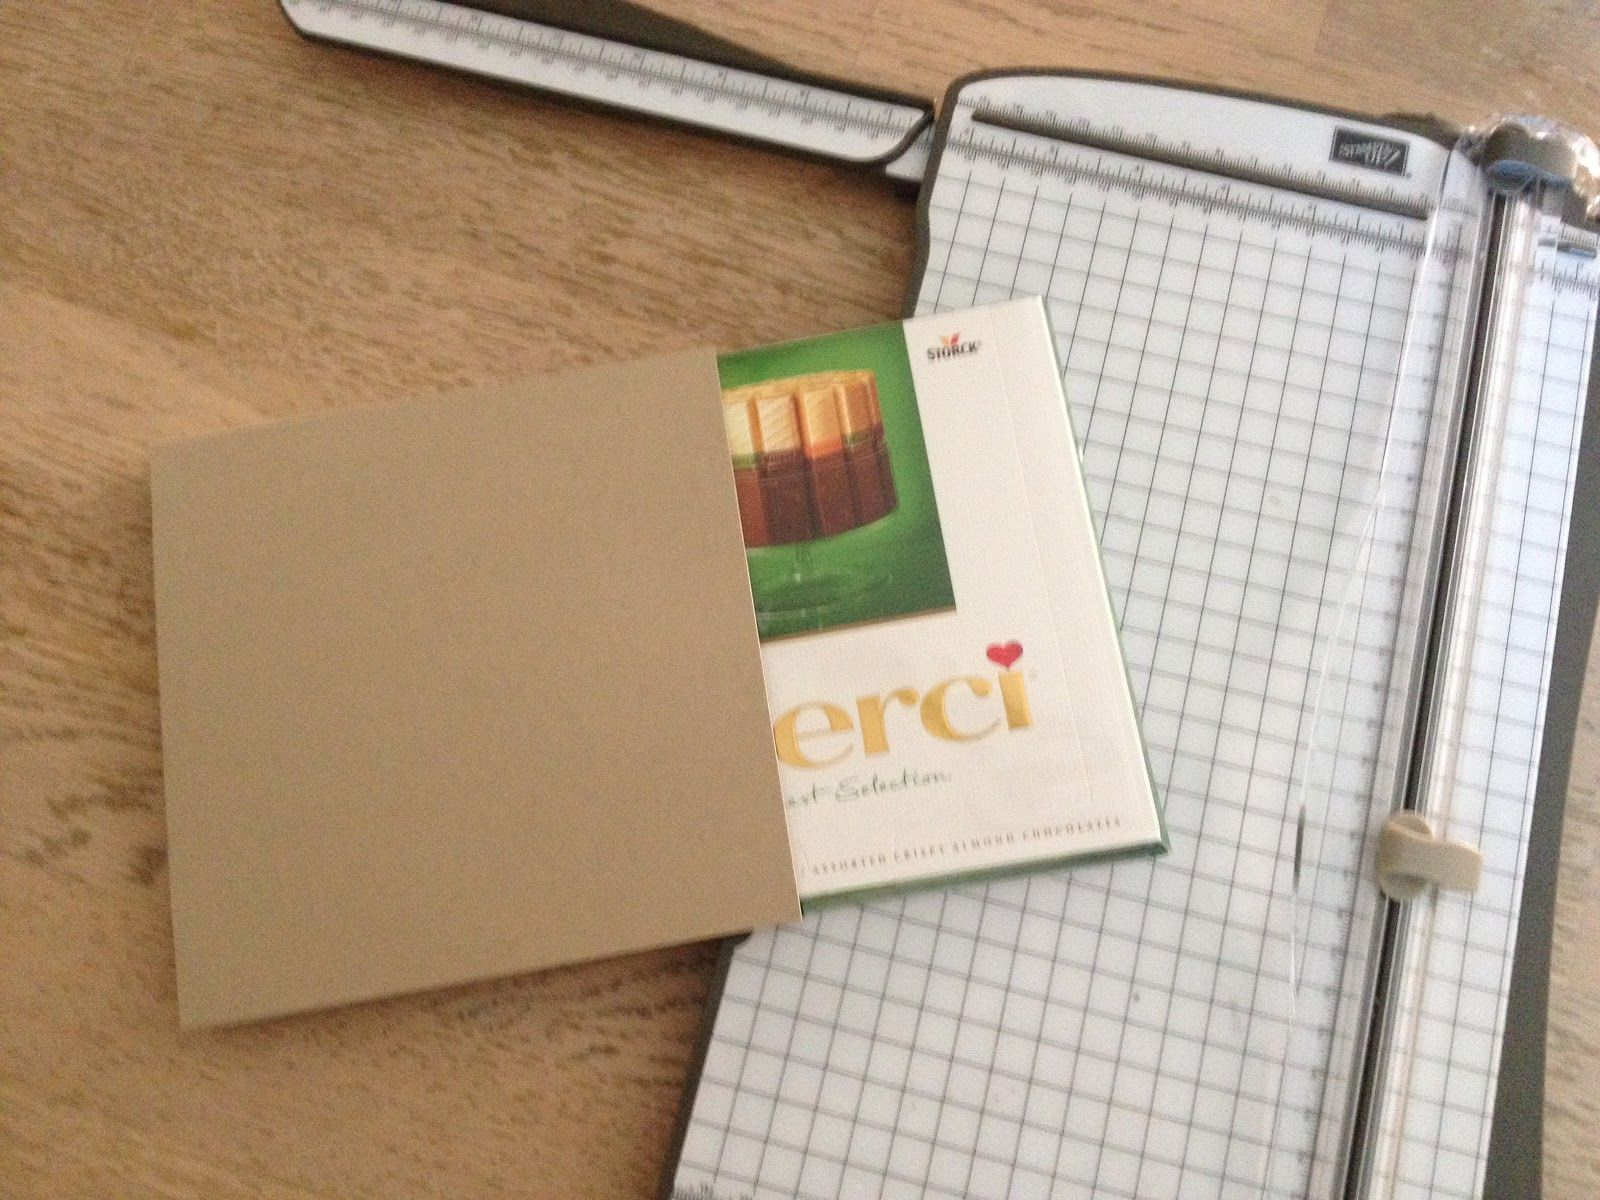 stempellicht anleitung f r merci verpackung verpackungsideen. Black Bedroom Furniture Sets. Home Design Ideas